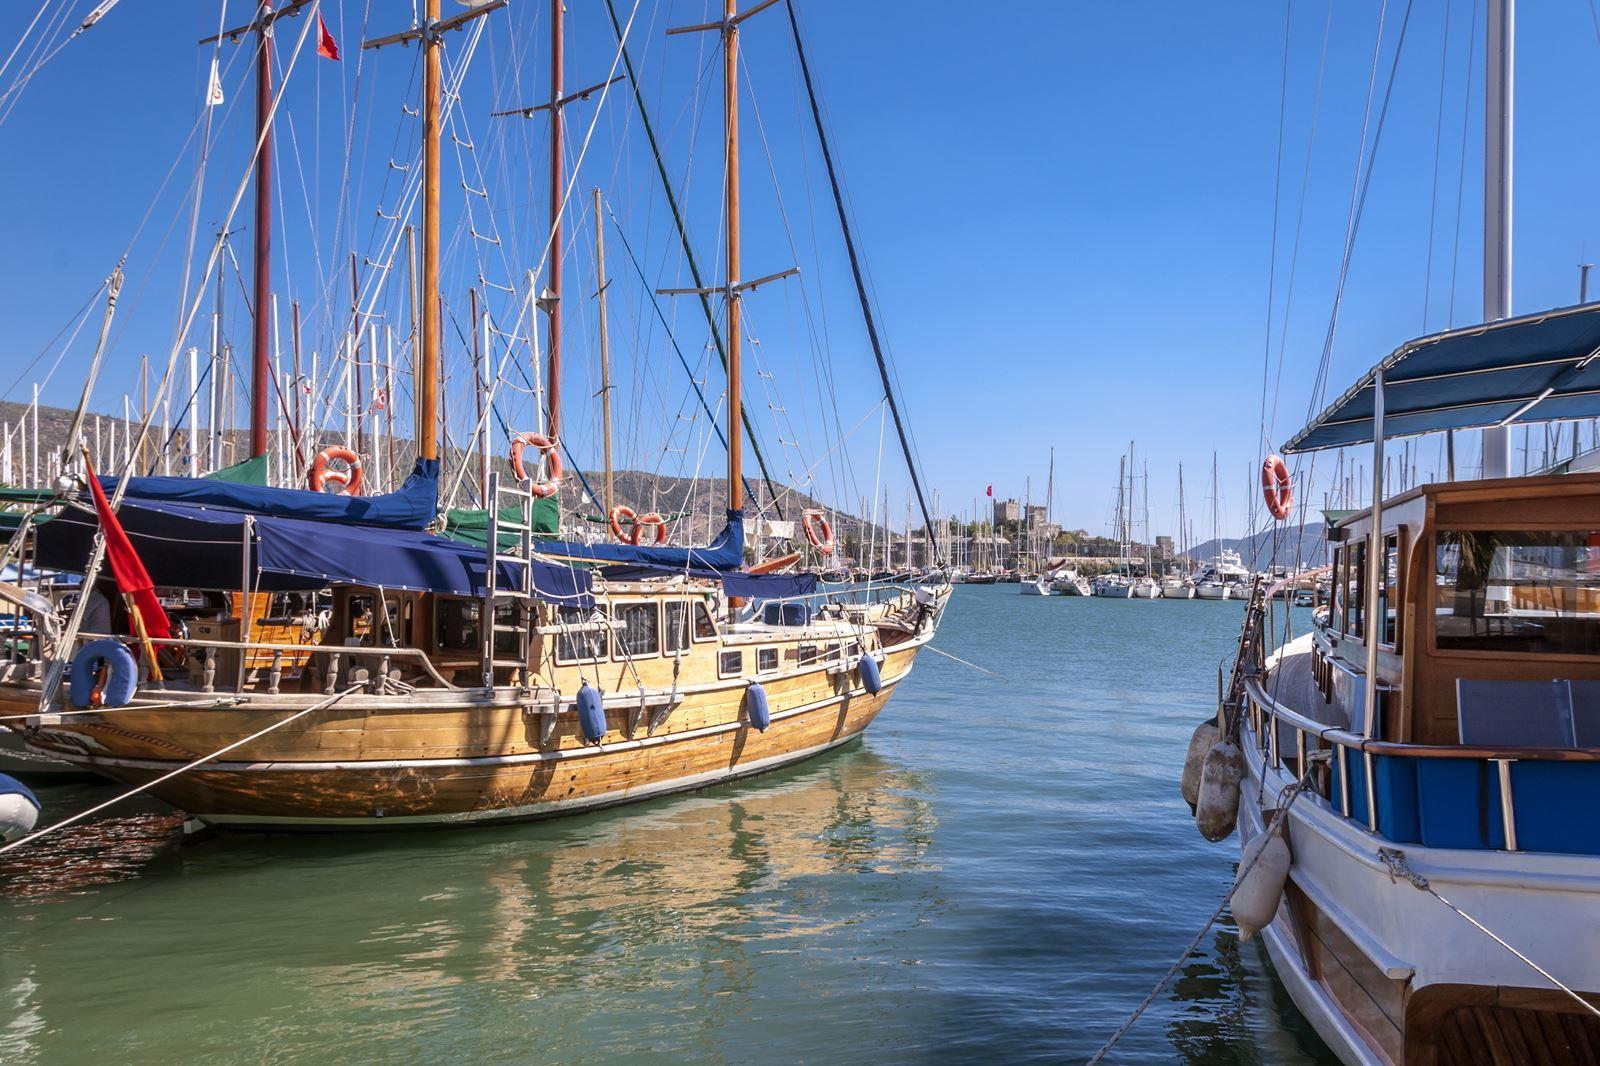 Blue Cruise&Azure by Yelken corendon